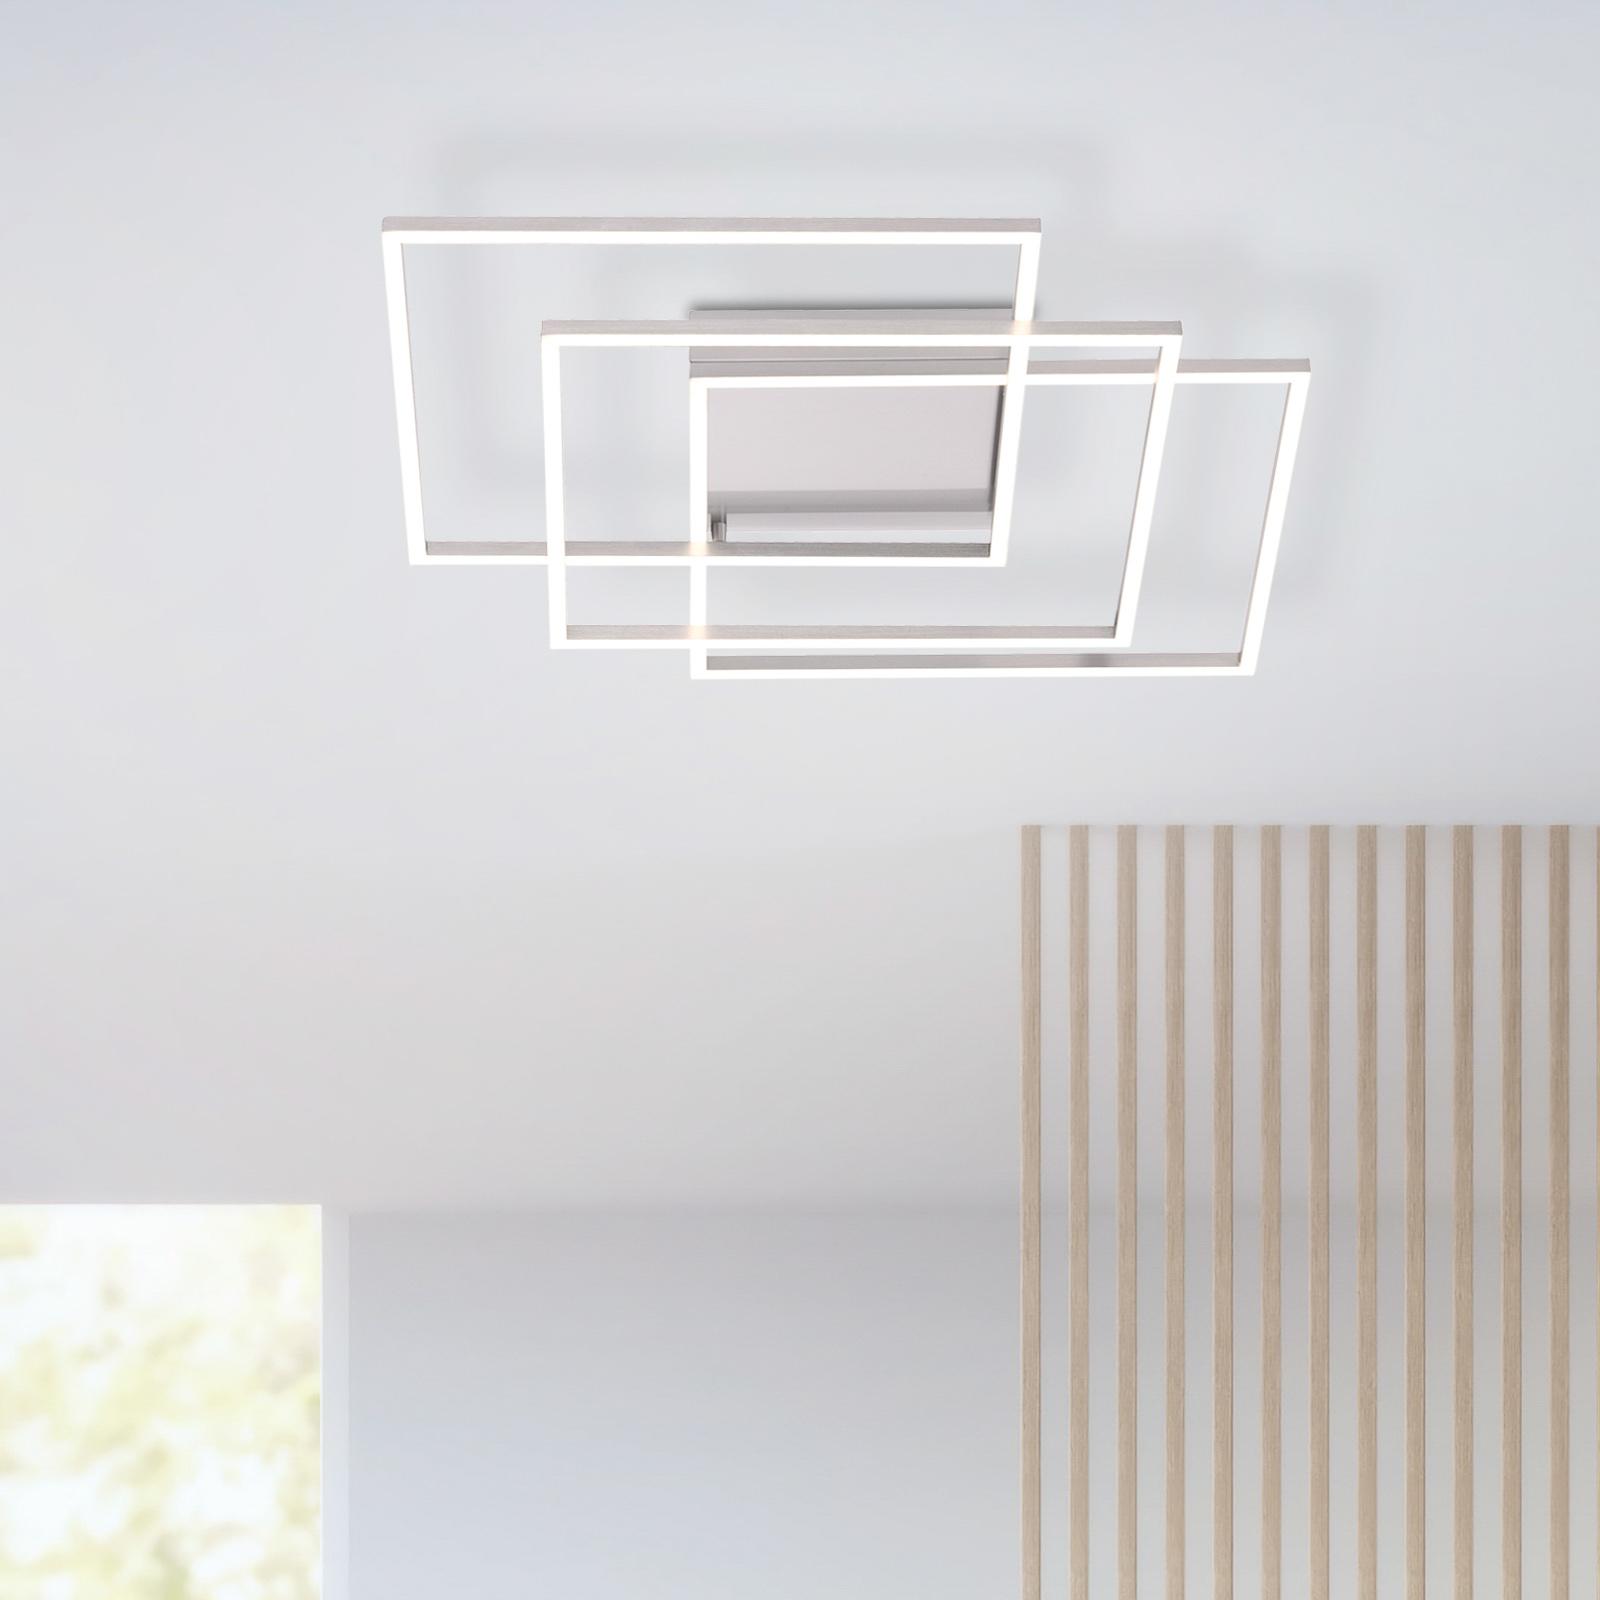 Paul Neuhaus Q-INIGO LED-Deckenleuchte, 60cm